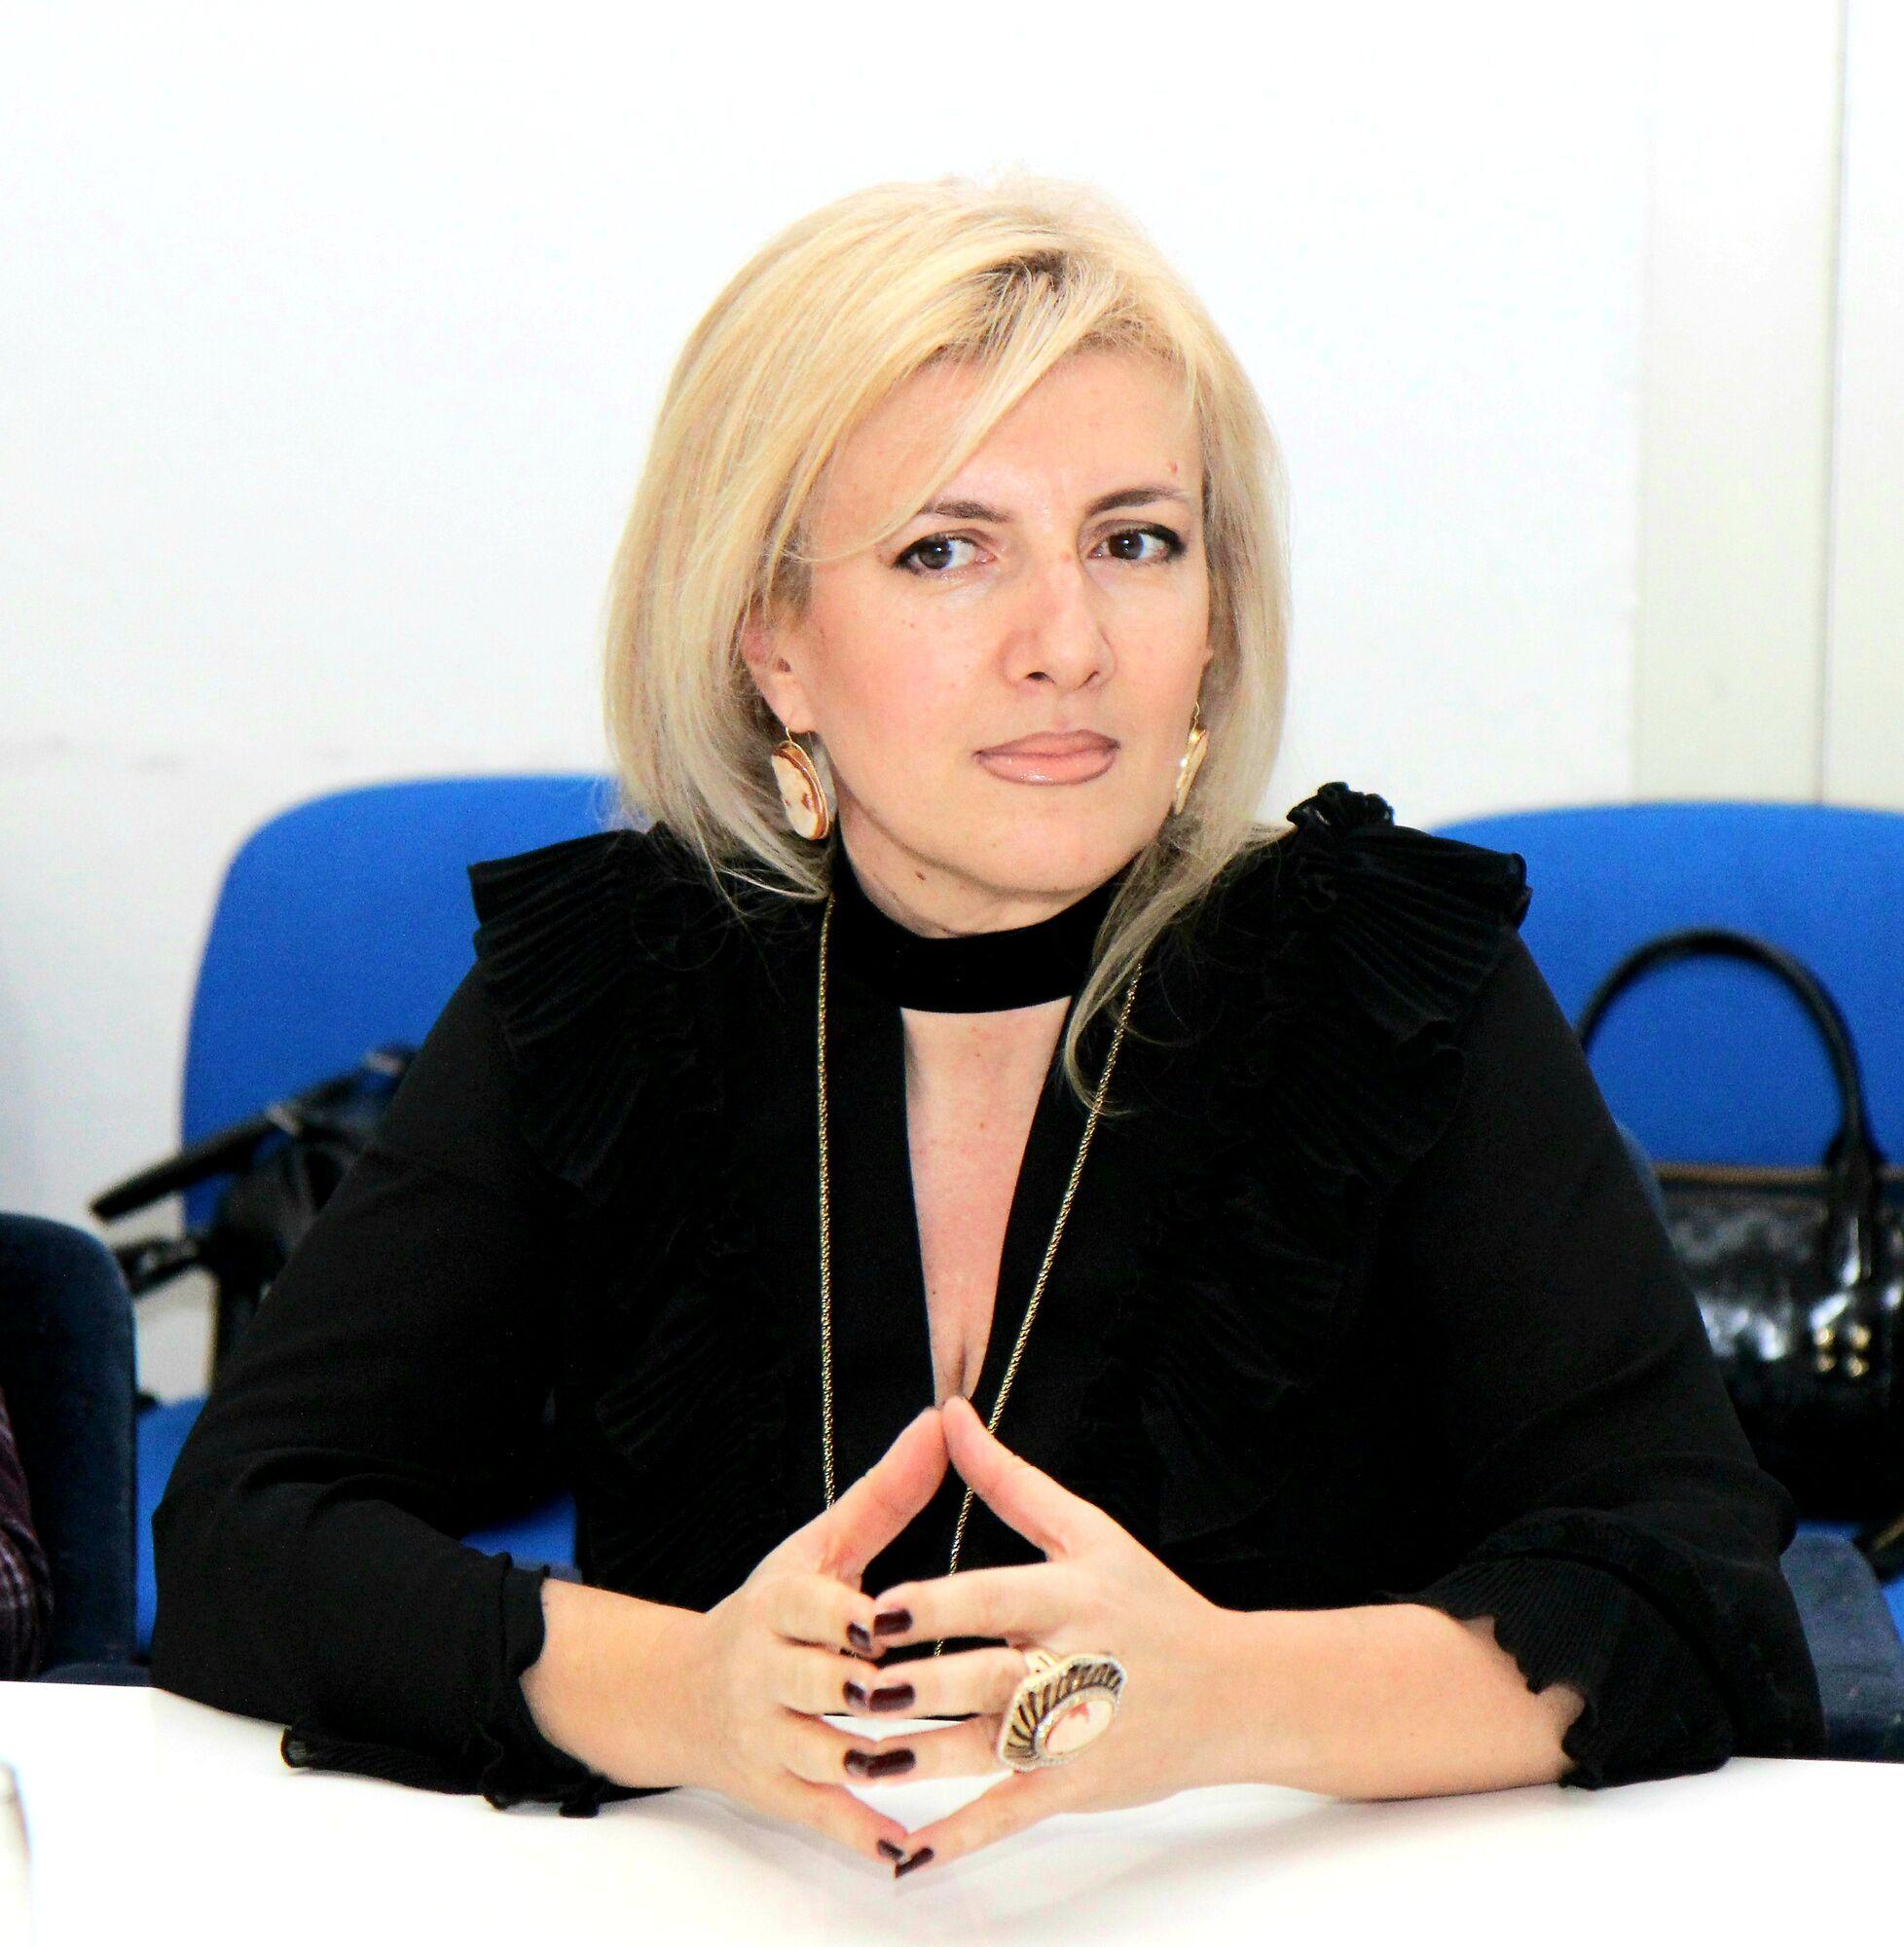 Анастасия .Миранович, председатель жюри.